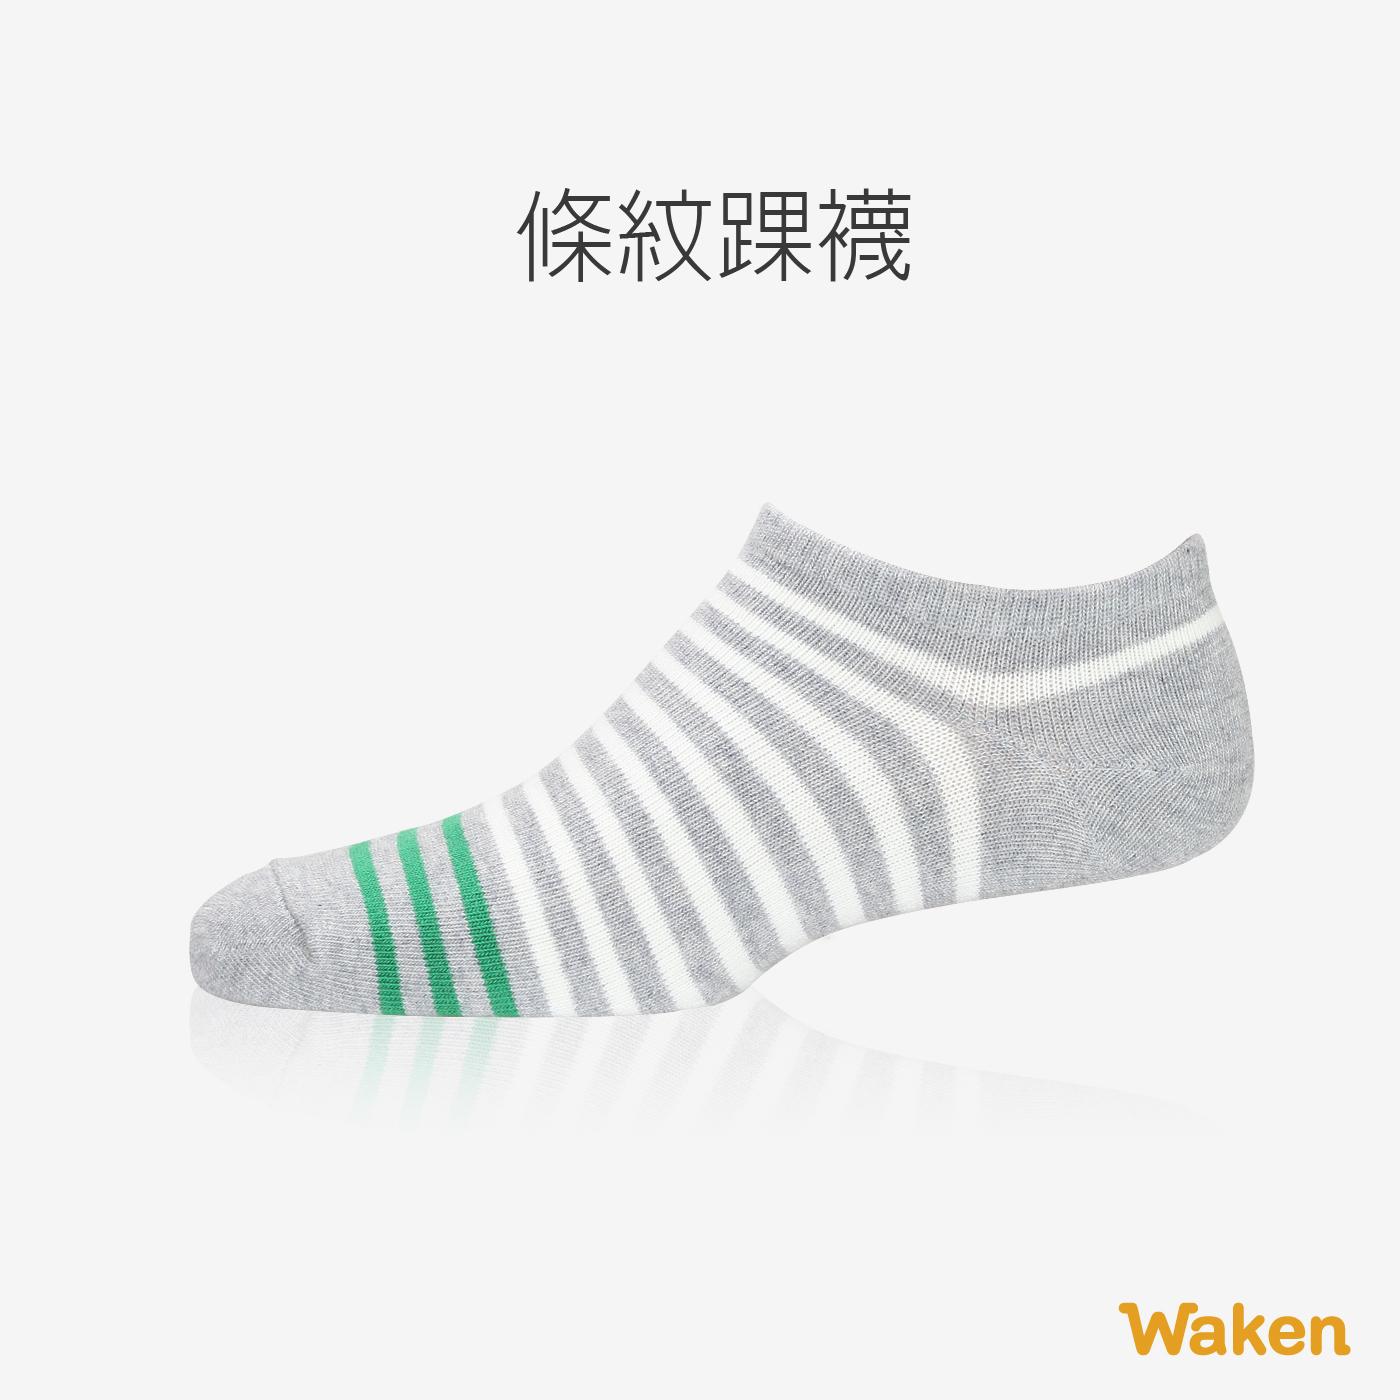 Waken  精梳棉條紋船型襪 / 淺灰 / 男款